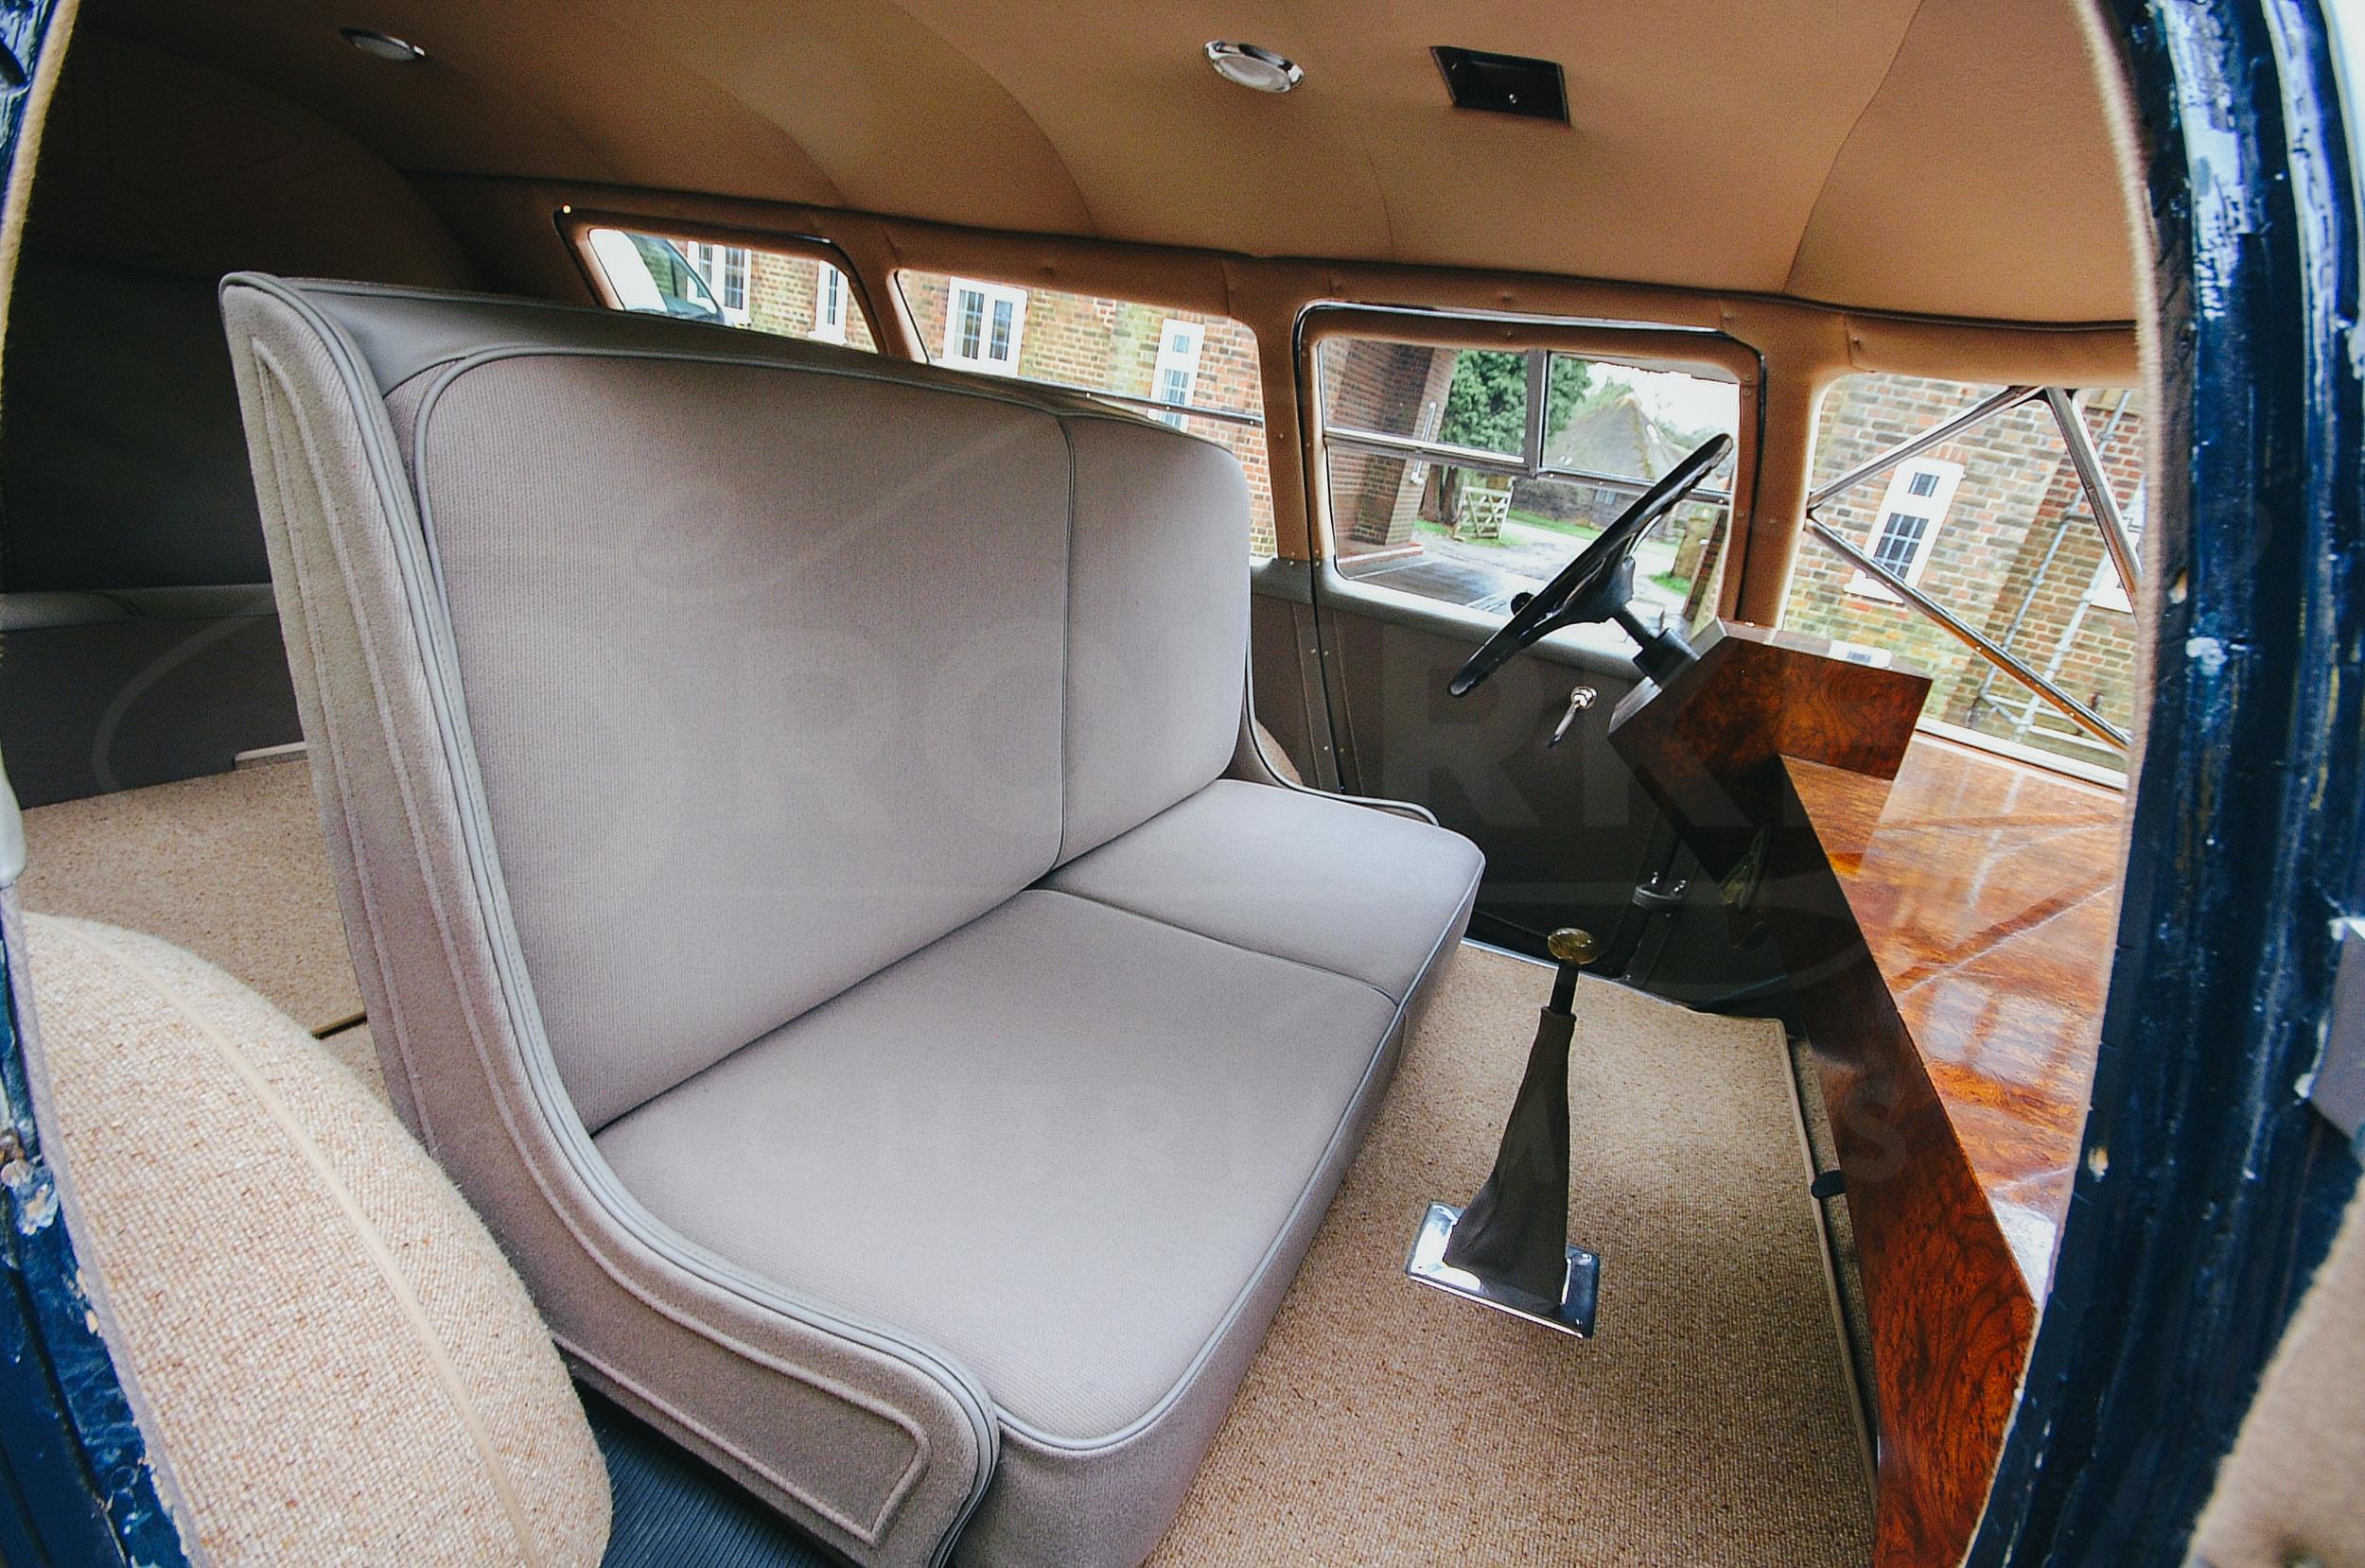 o-rourke-coachtrimmers-dymaxion-car-3-7.jpg